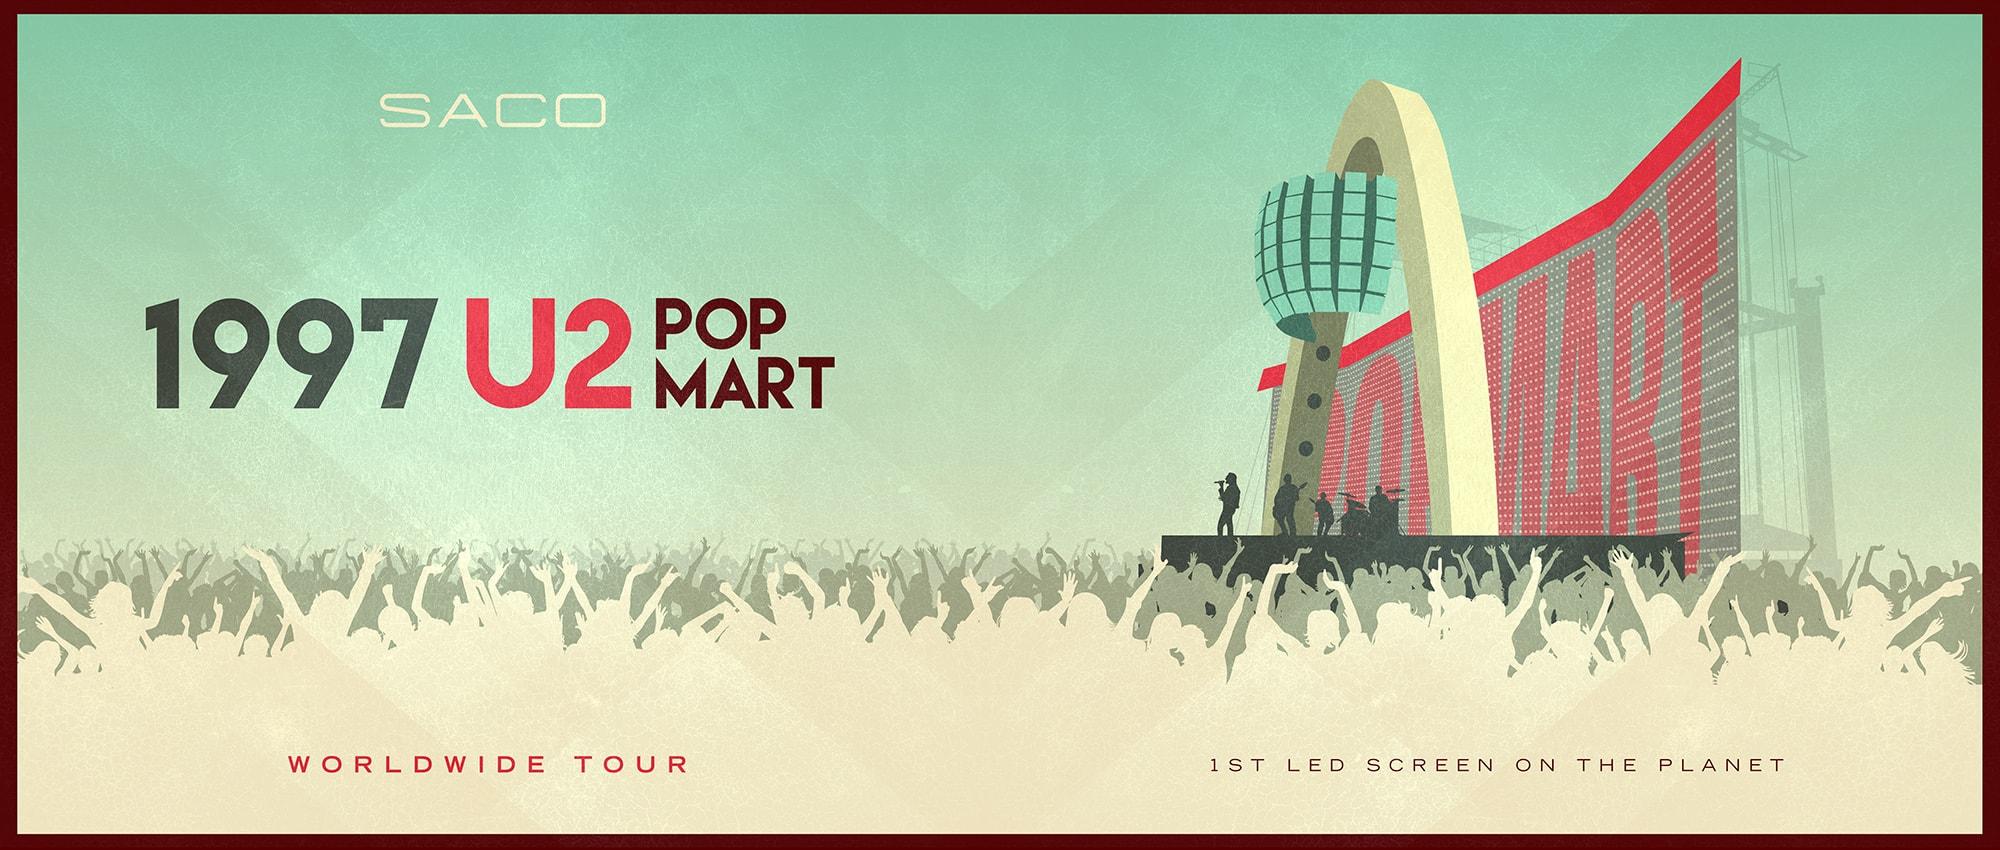 U2 POP MART TOUR POSTER